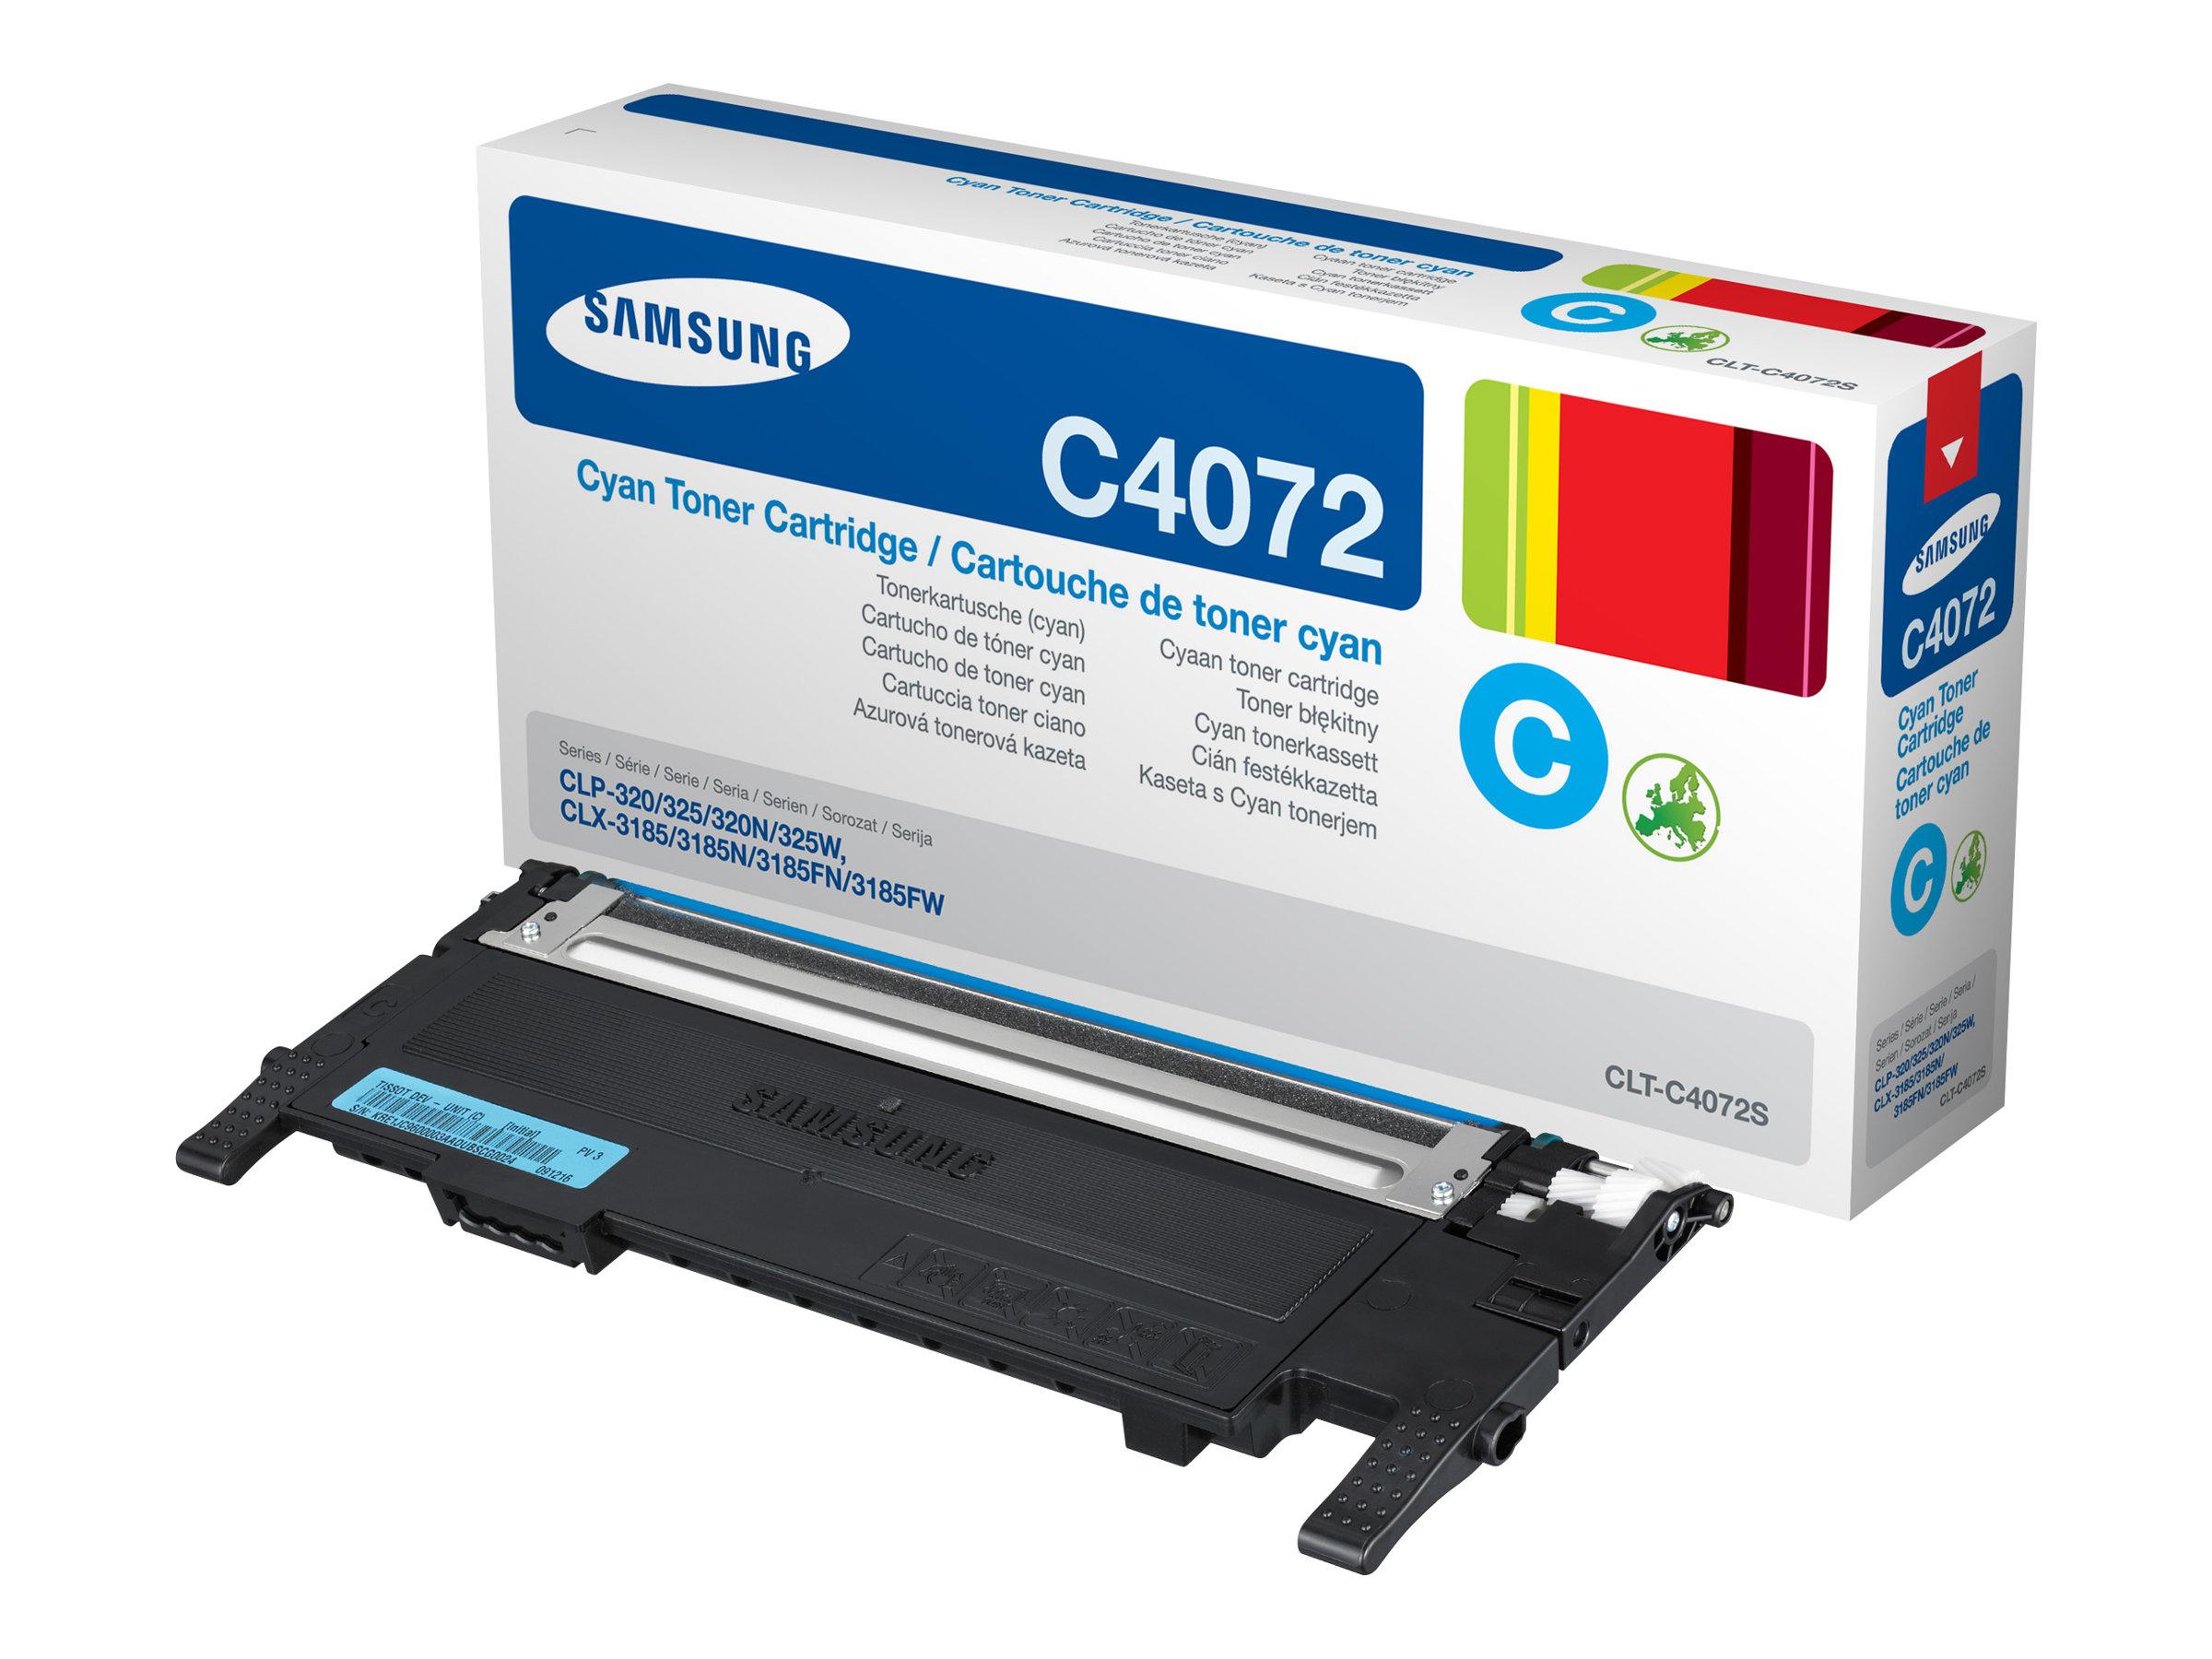 Samsung CLT-C4072S - cyan - originale - cartouche de toner